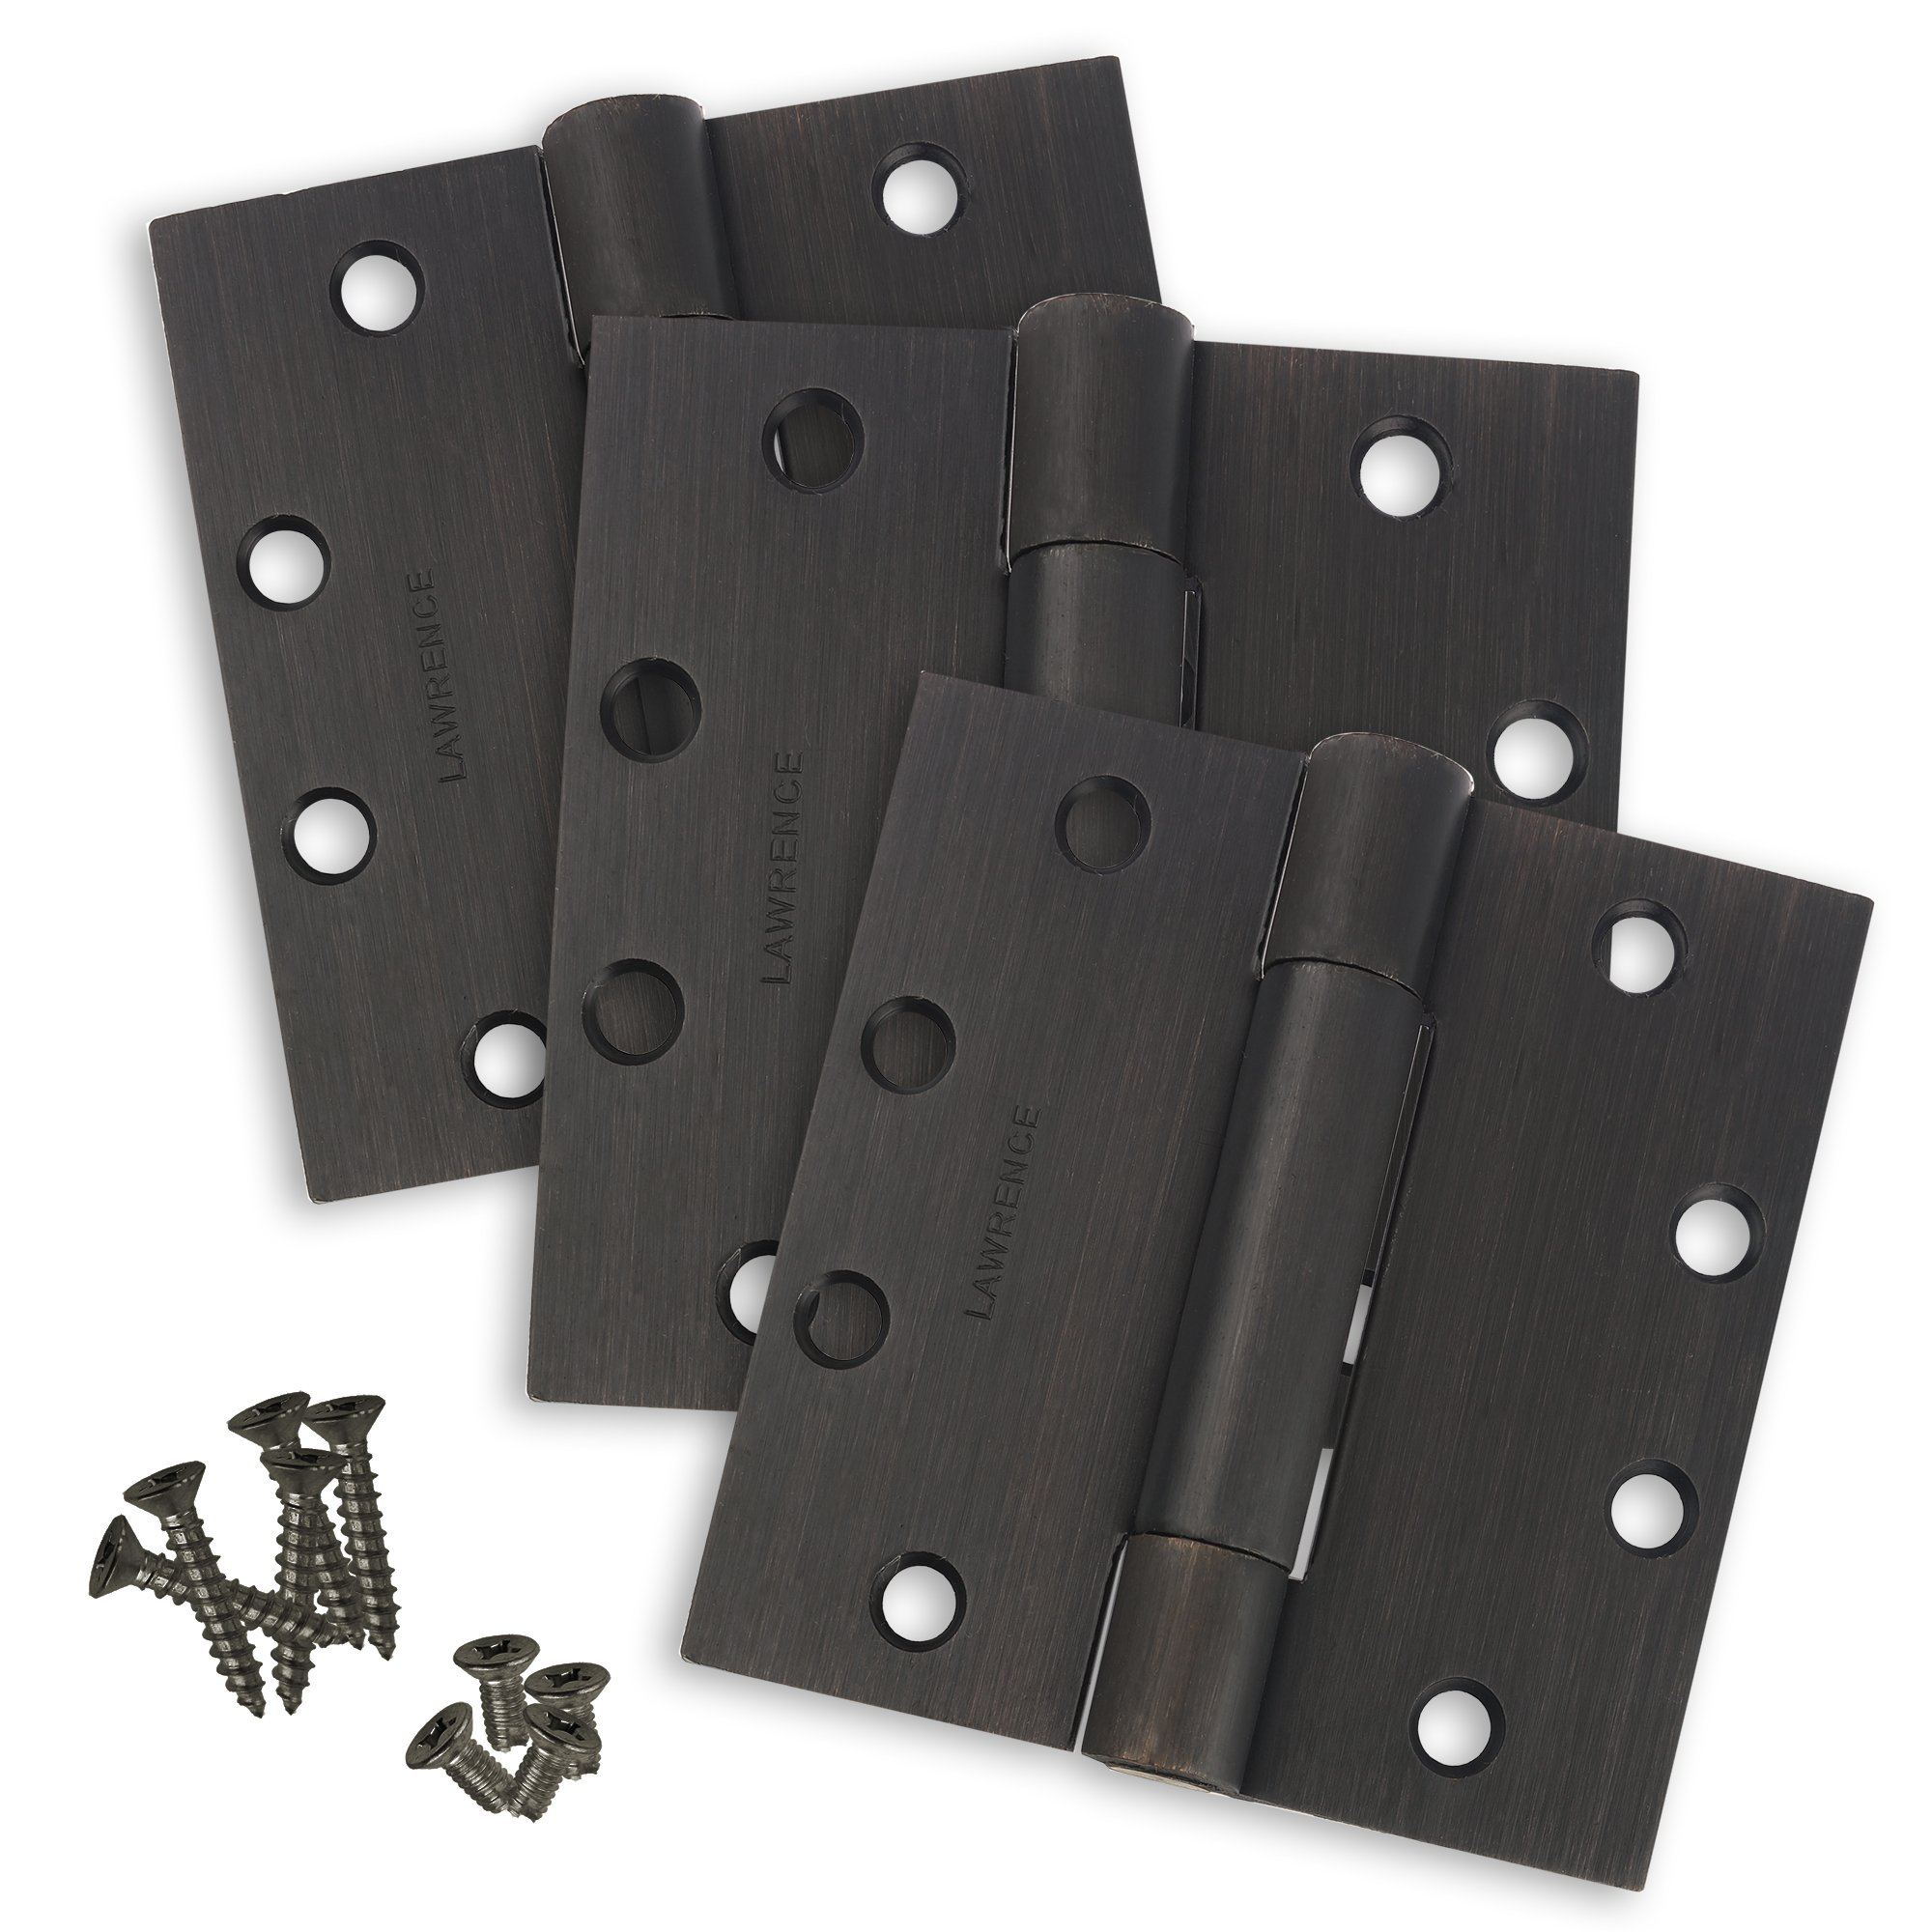 Commercial Door Hinges, Standard Weight Butt Hinge, 4.5 x 4.5, Lawrence Hardware